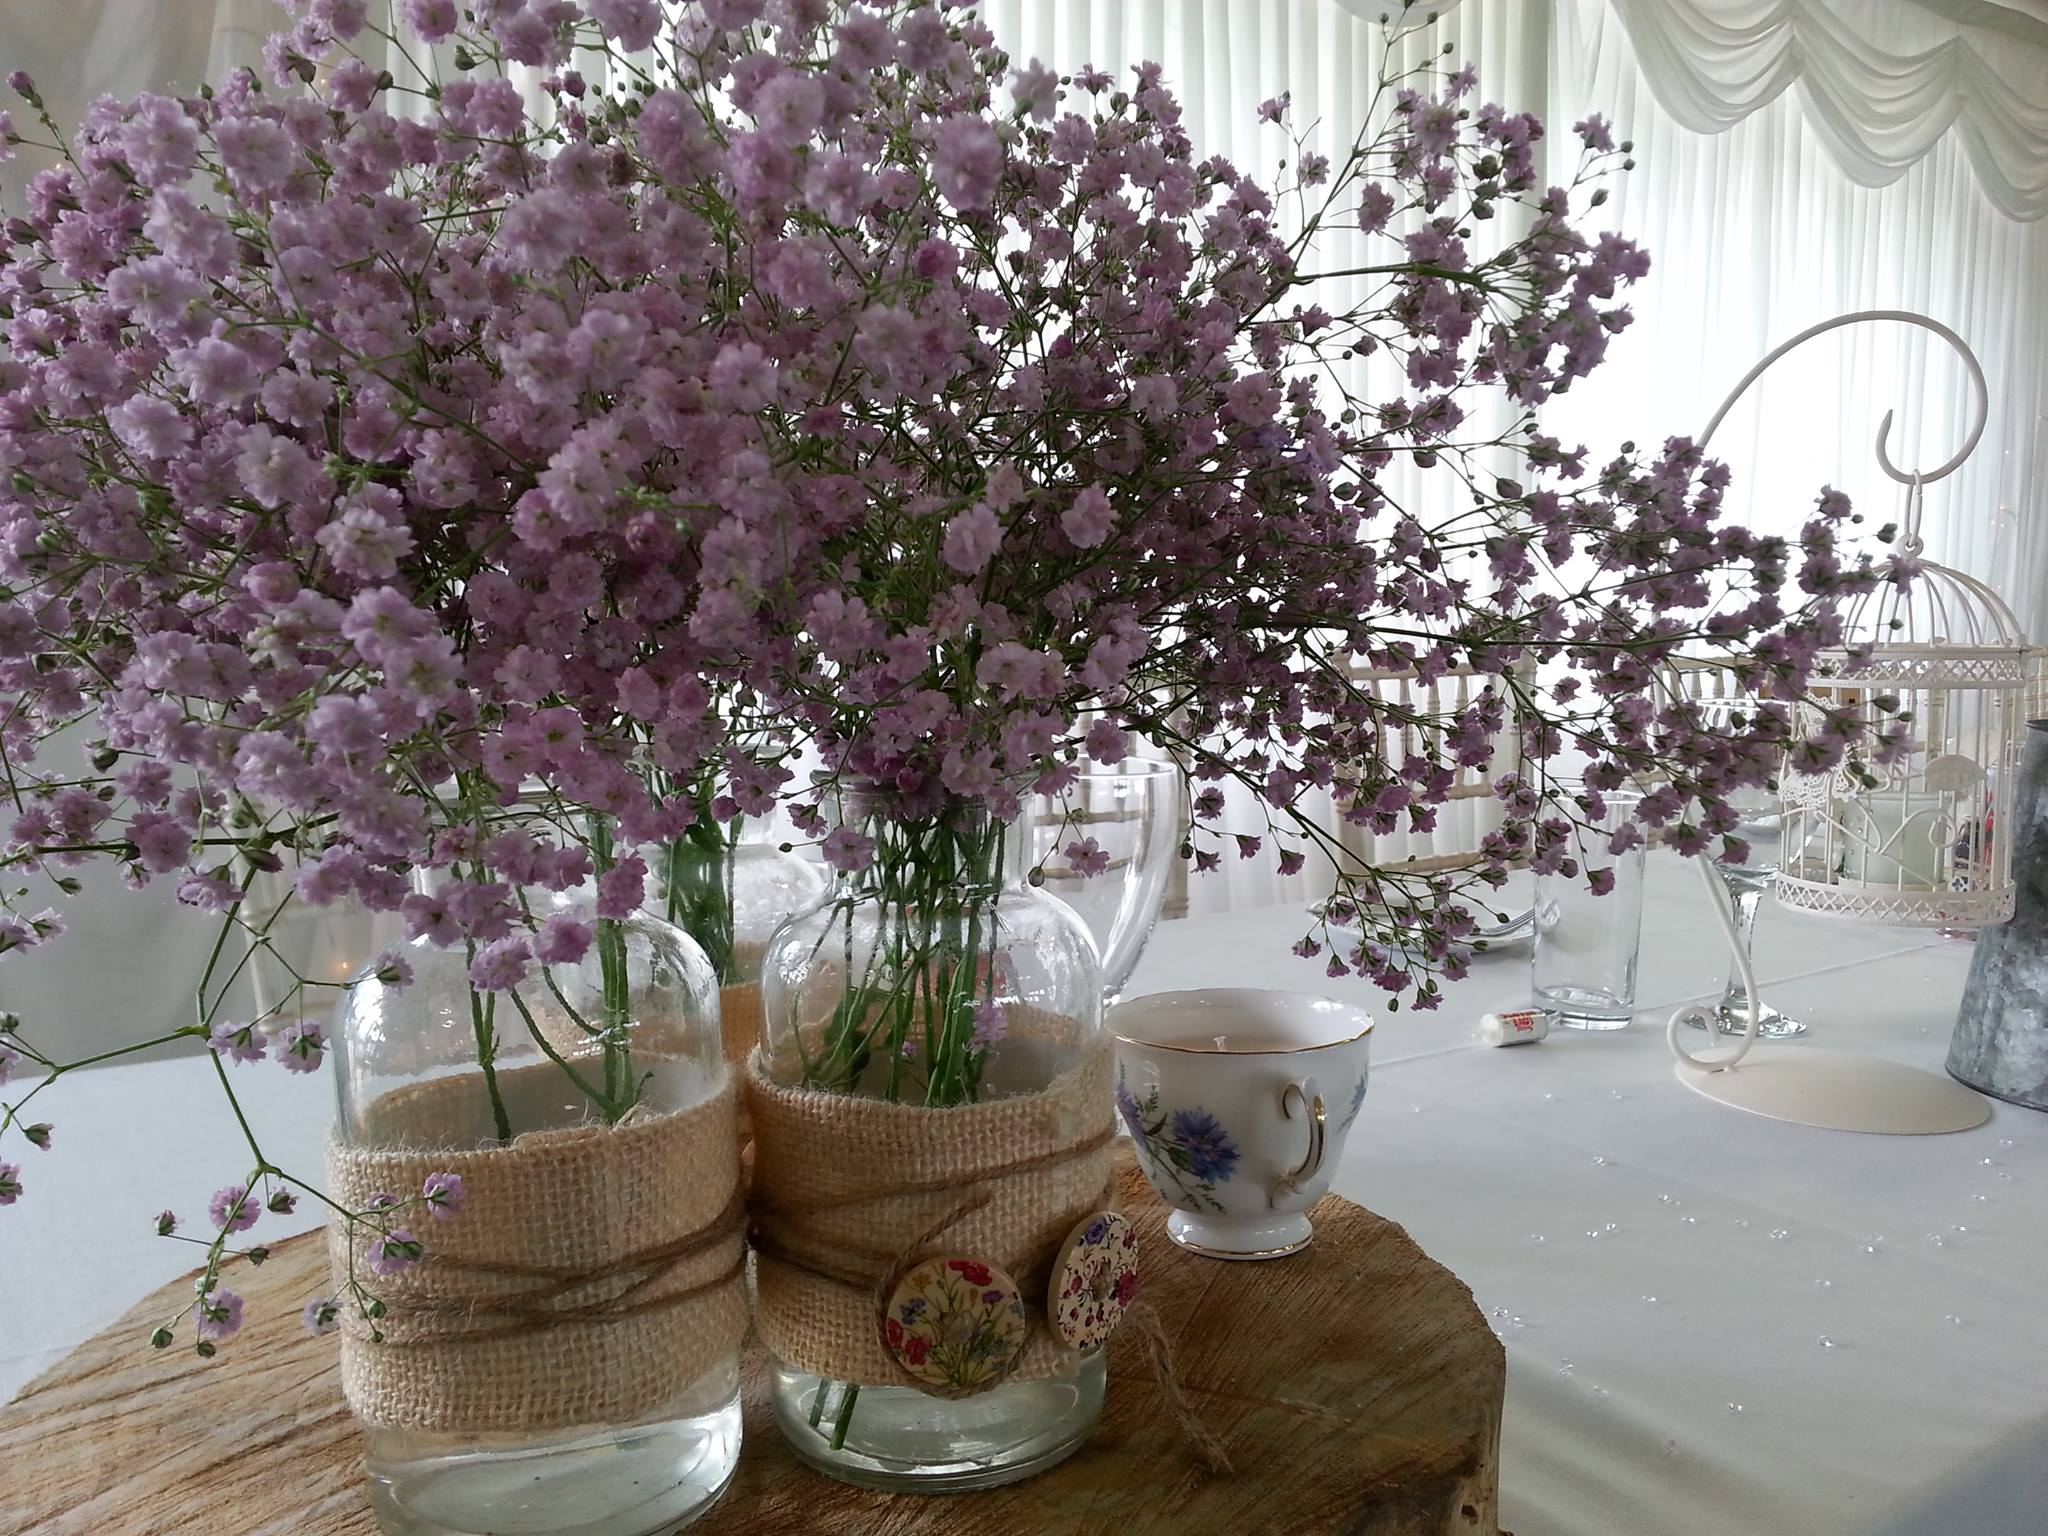 http://www.wokingham.cc/wp-content/uploads/2017/01/flowers_on_table.jpg